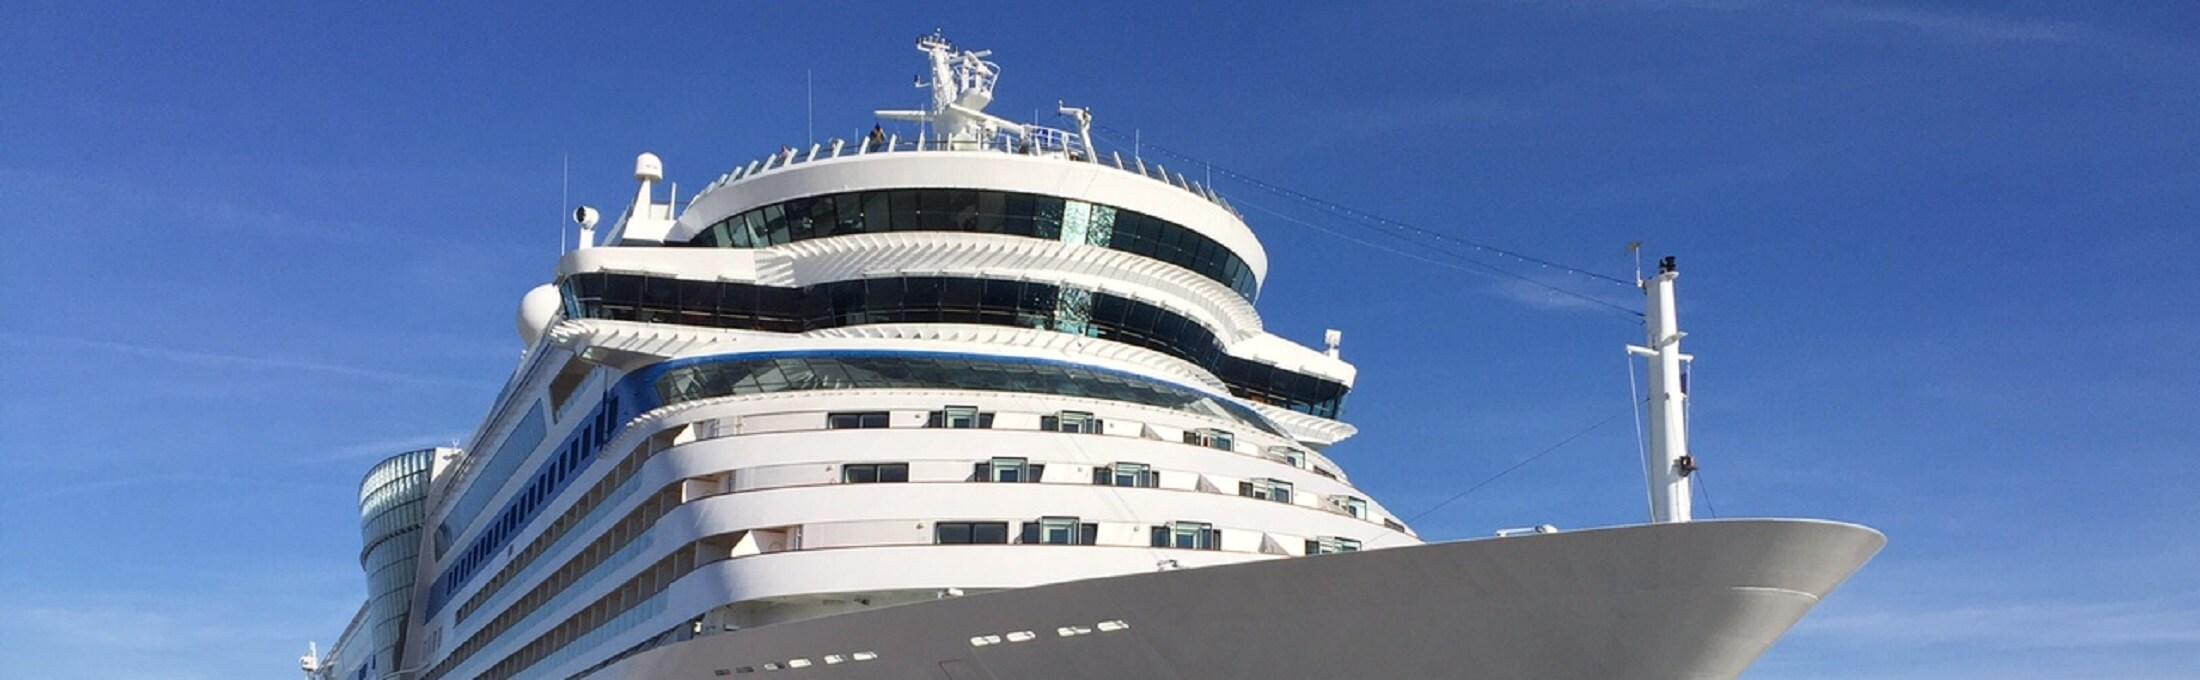 Studium: Tourismus-, Kreuzfahrt- & Hospitality-Management in Hannover